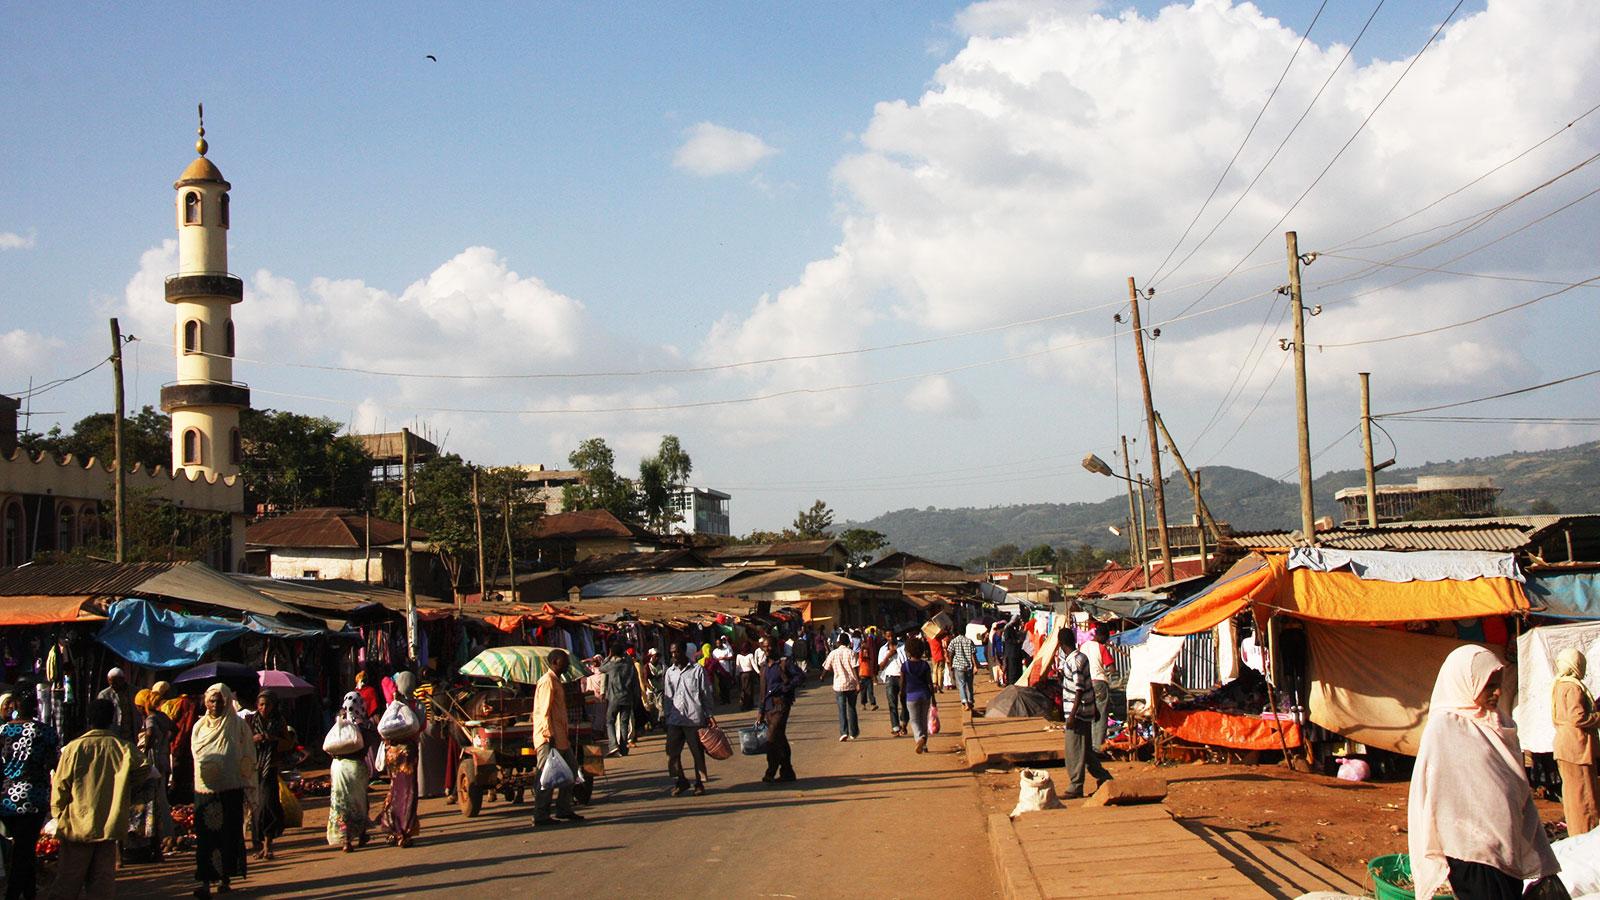 Bonga: Ethiopia's epicenter of Arabica coffee | CNN Travel